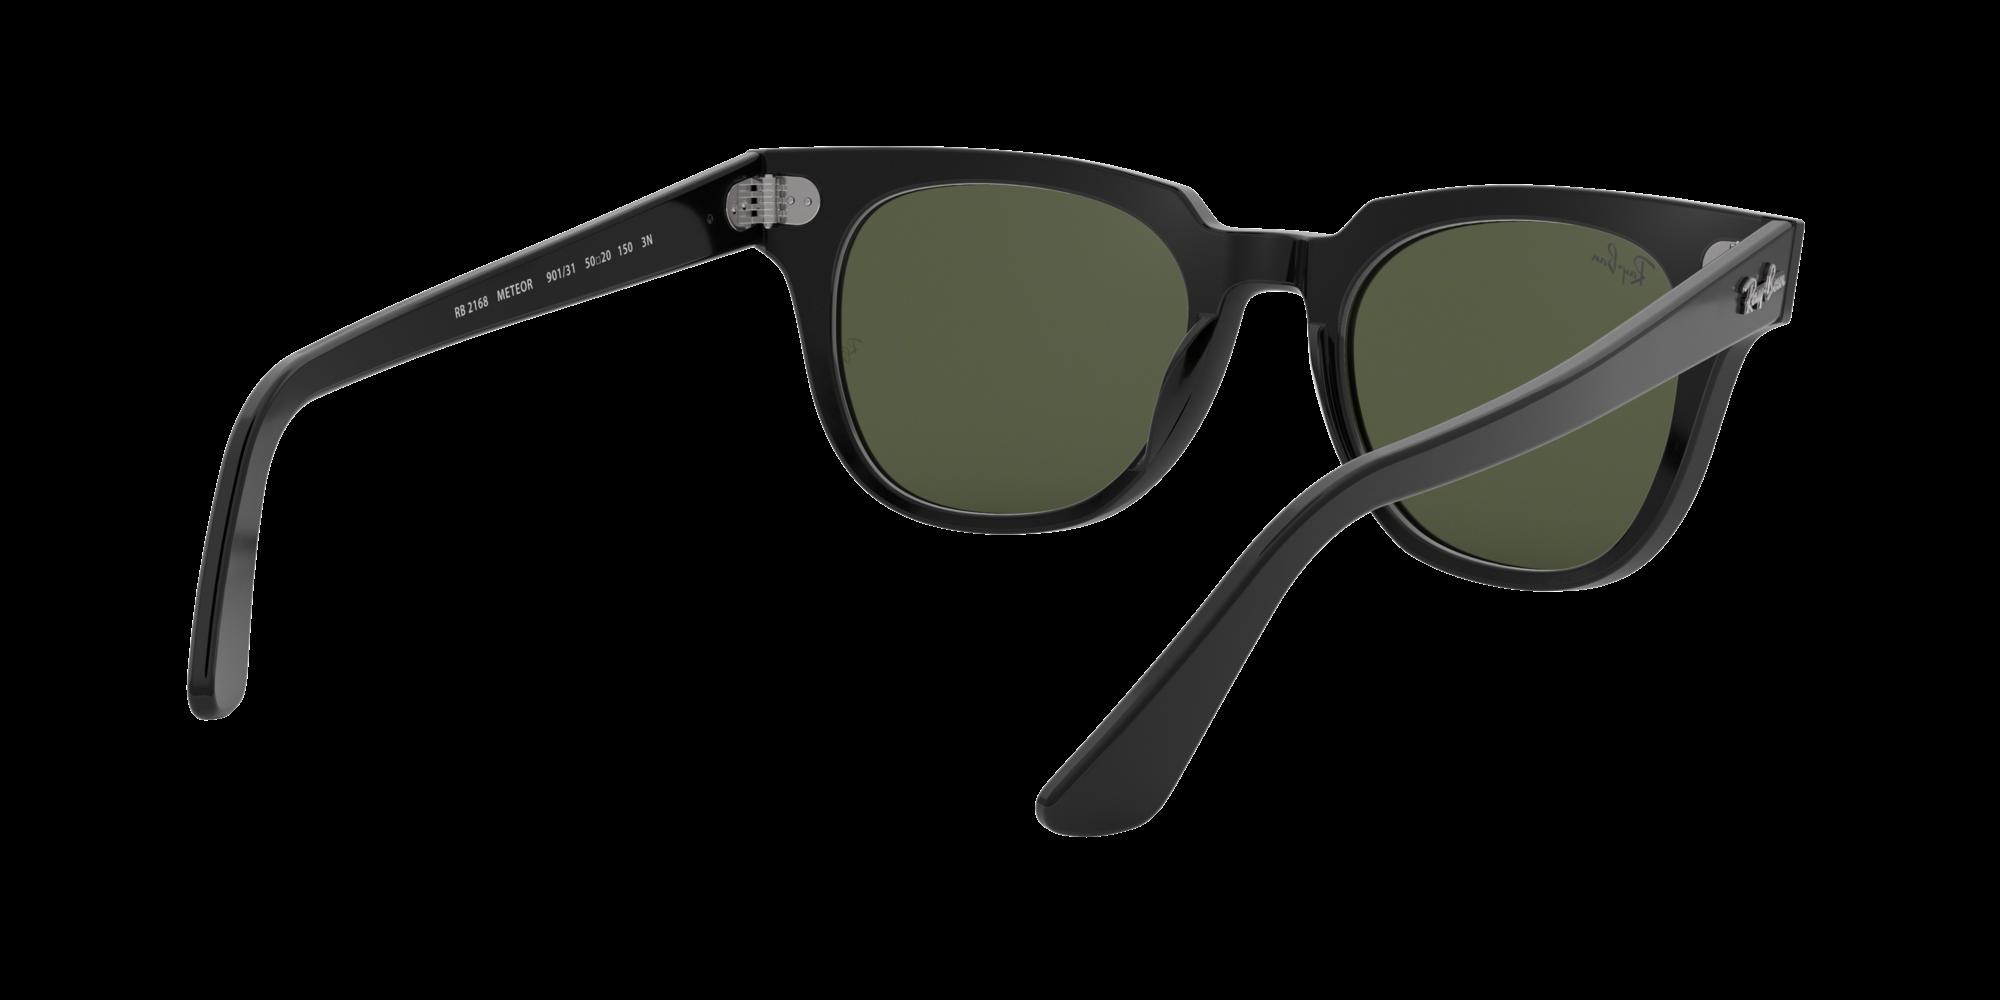 a8cd62aeaf4 Sunglasses Ray-Ban Meteor Black RB2168 901 31 50-20 Medium